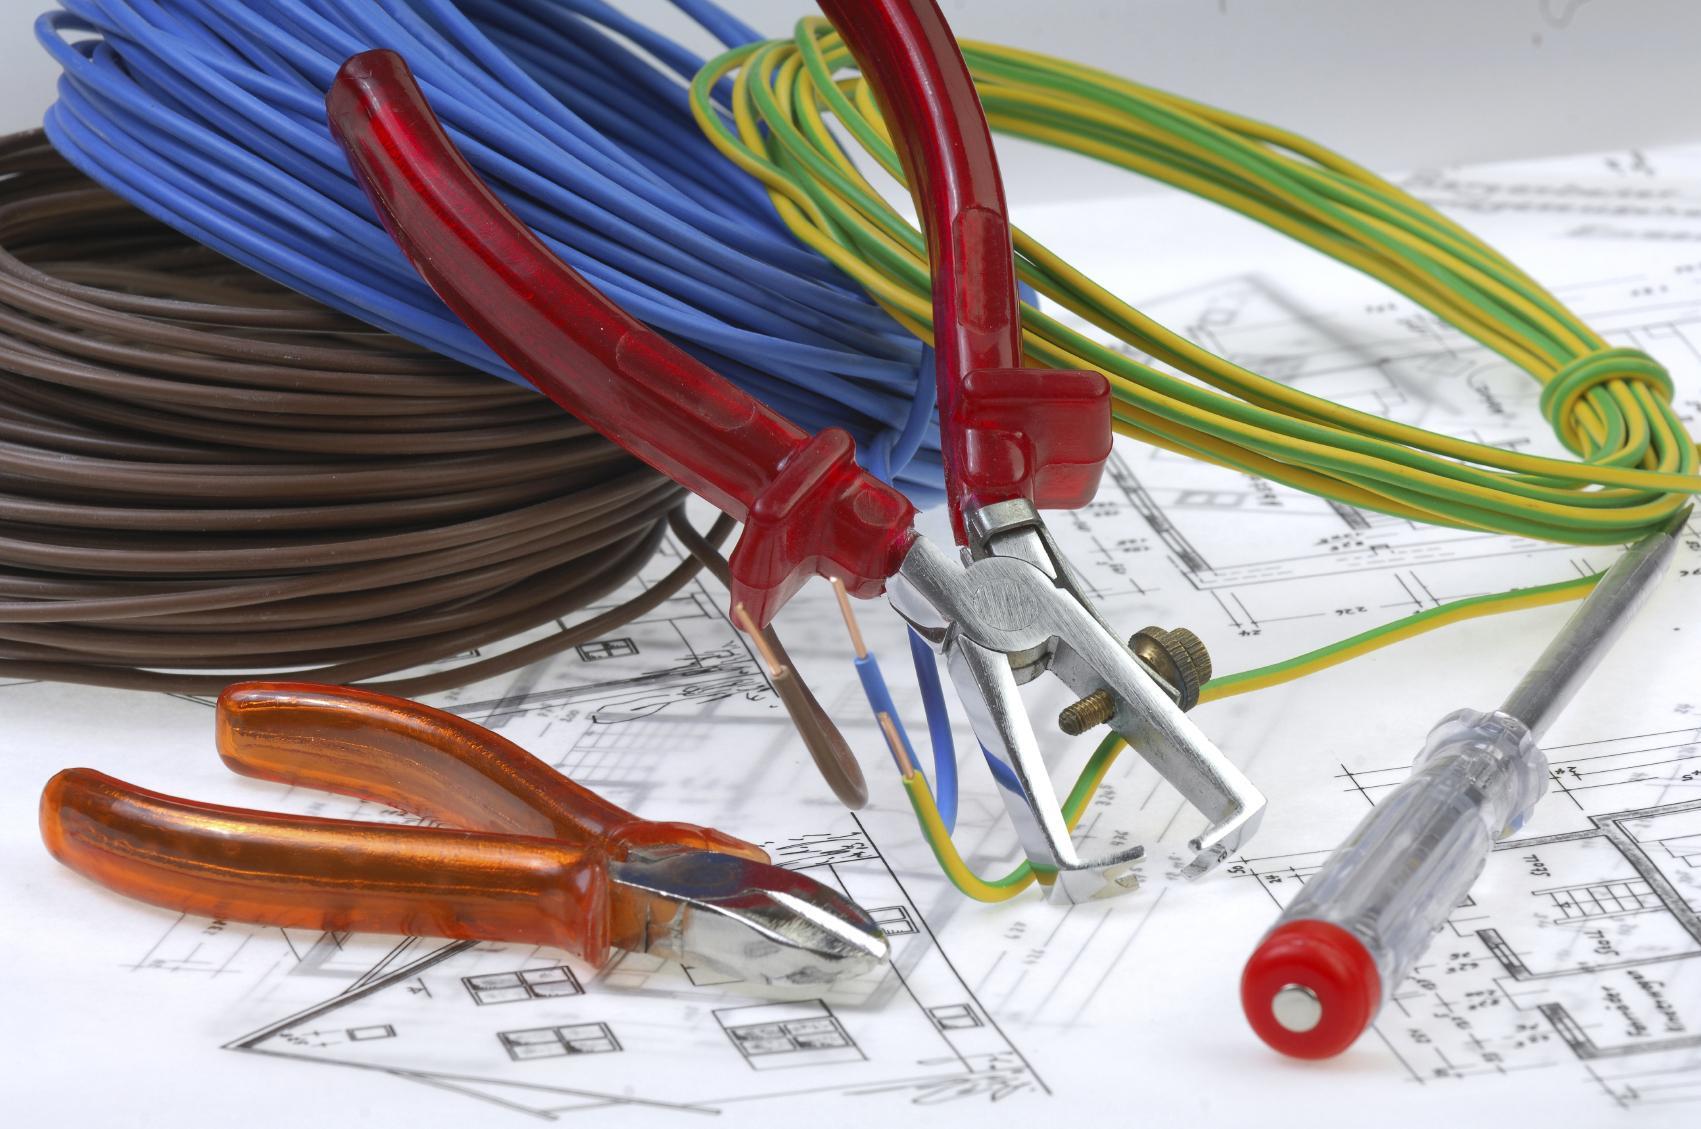 Technical services Dubai